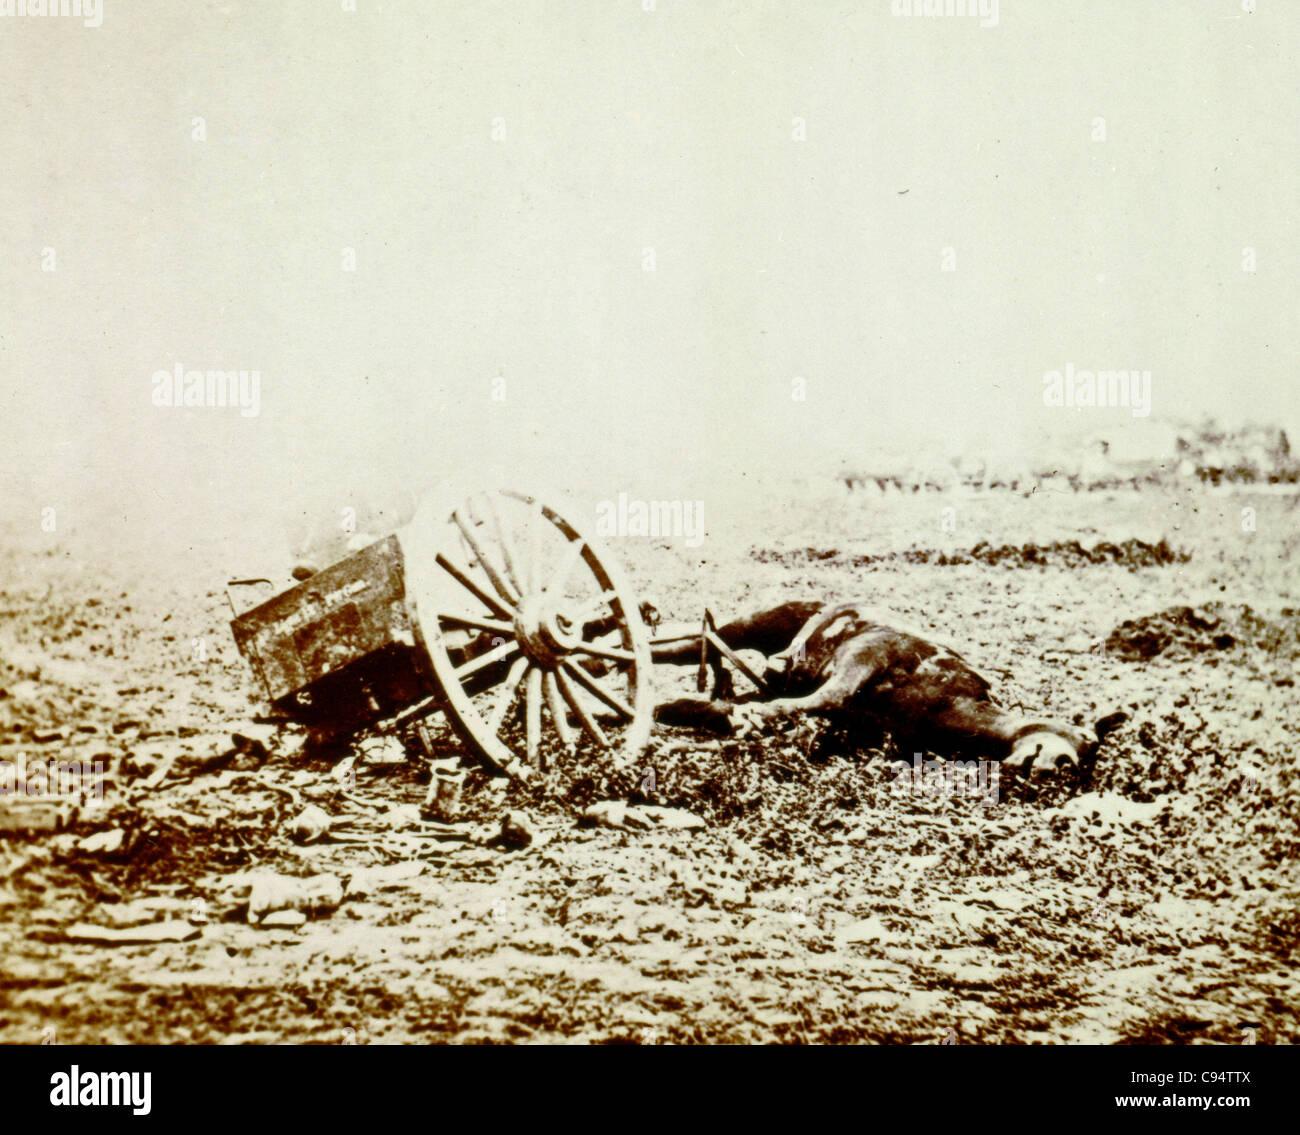 Dead horse on battlefield, Gettysburg, Pennsylvania - Stock Image